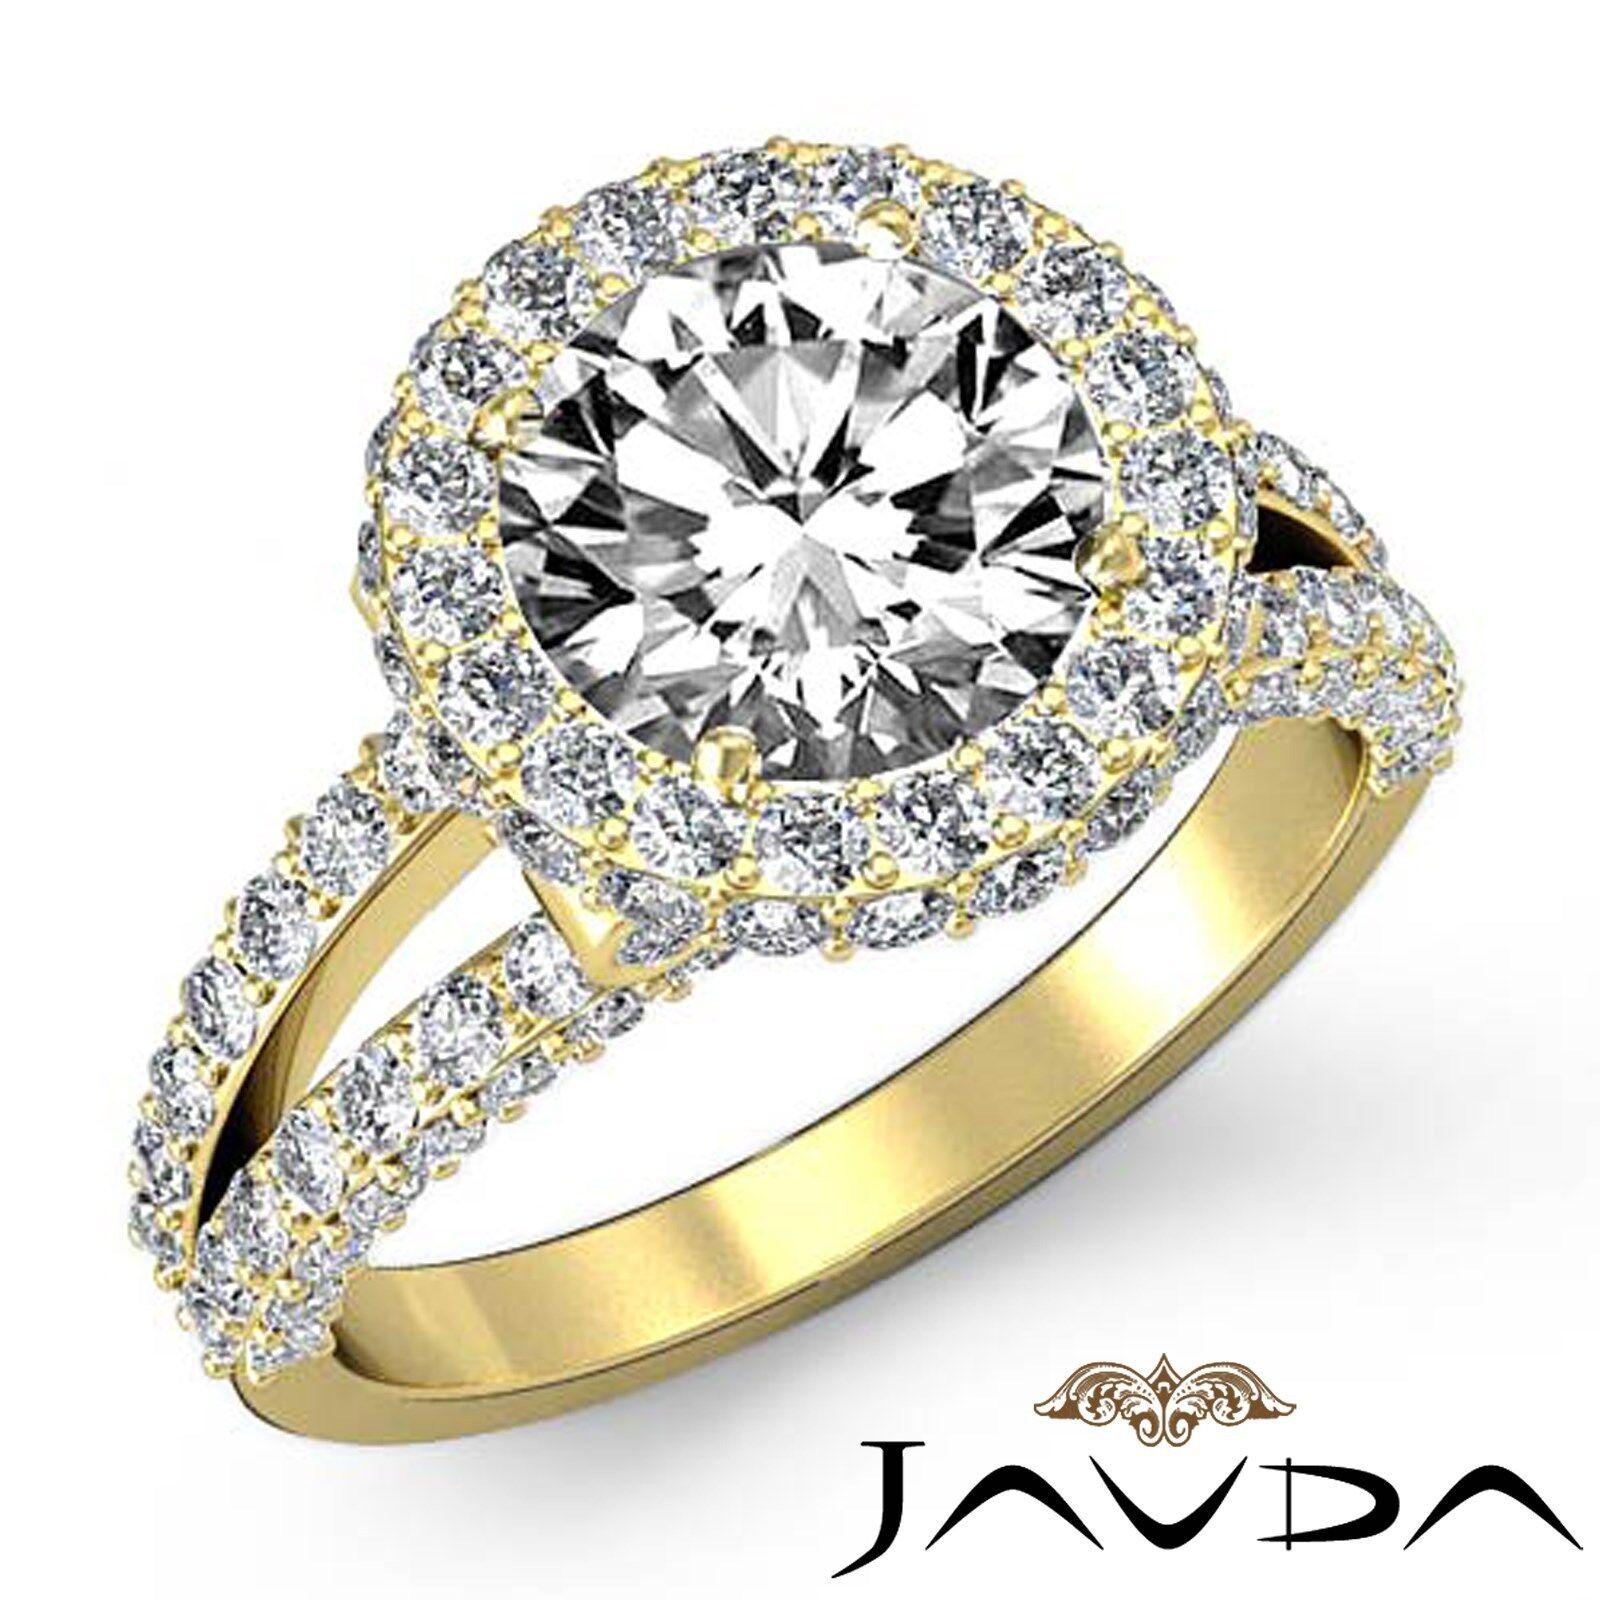 Circa Halo Split Shank Round Diamond Engagement Bezel Set Ring GIA F VS1 2.9 Ct